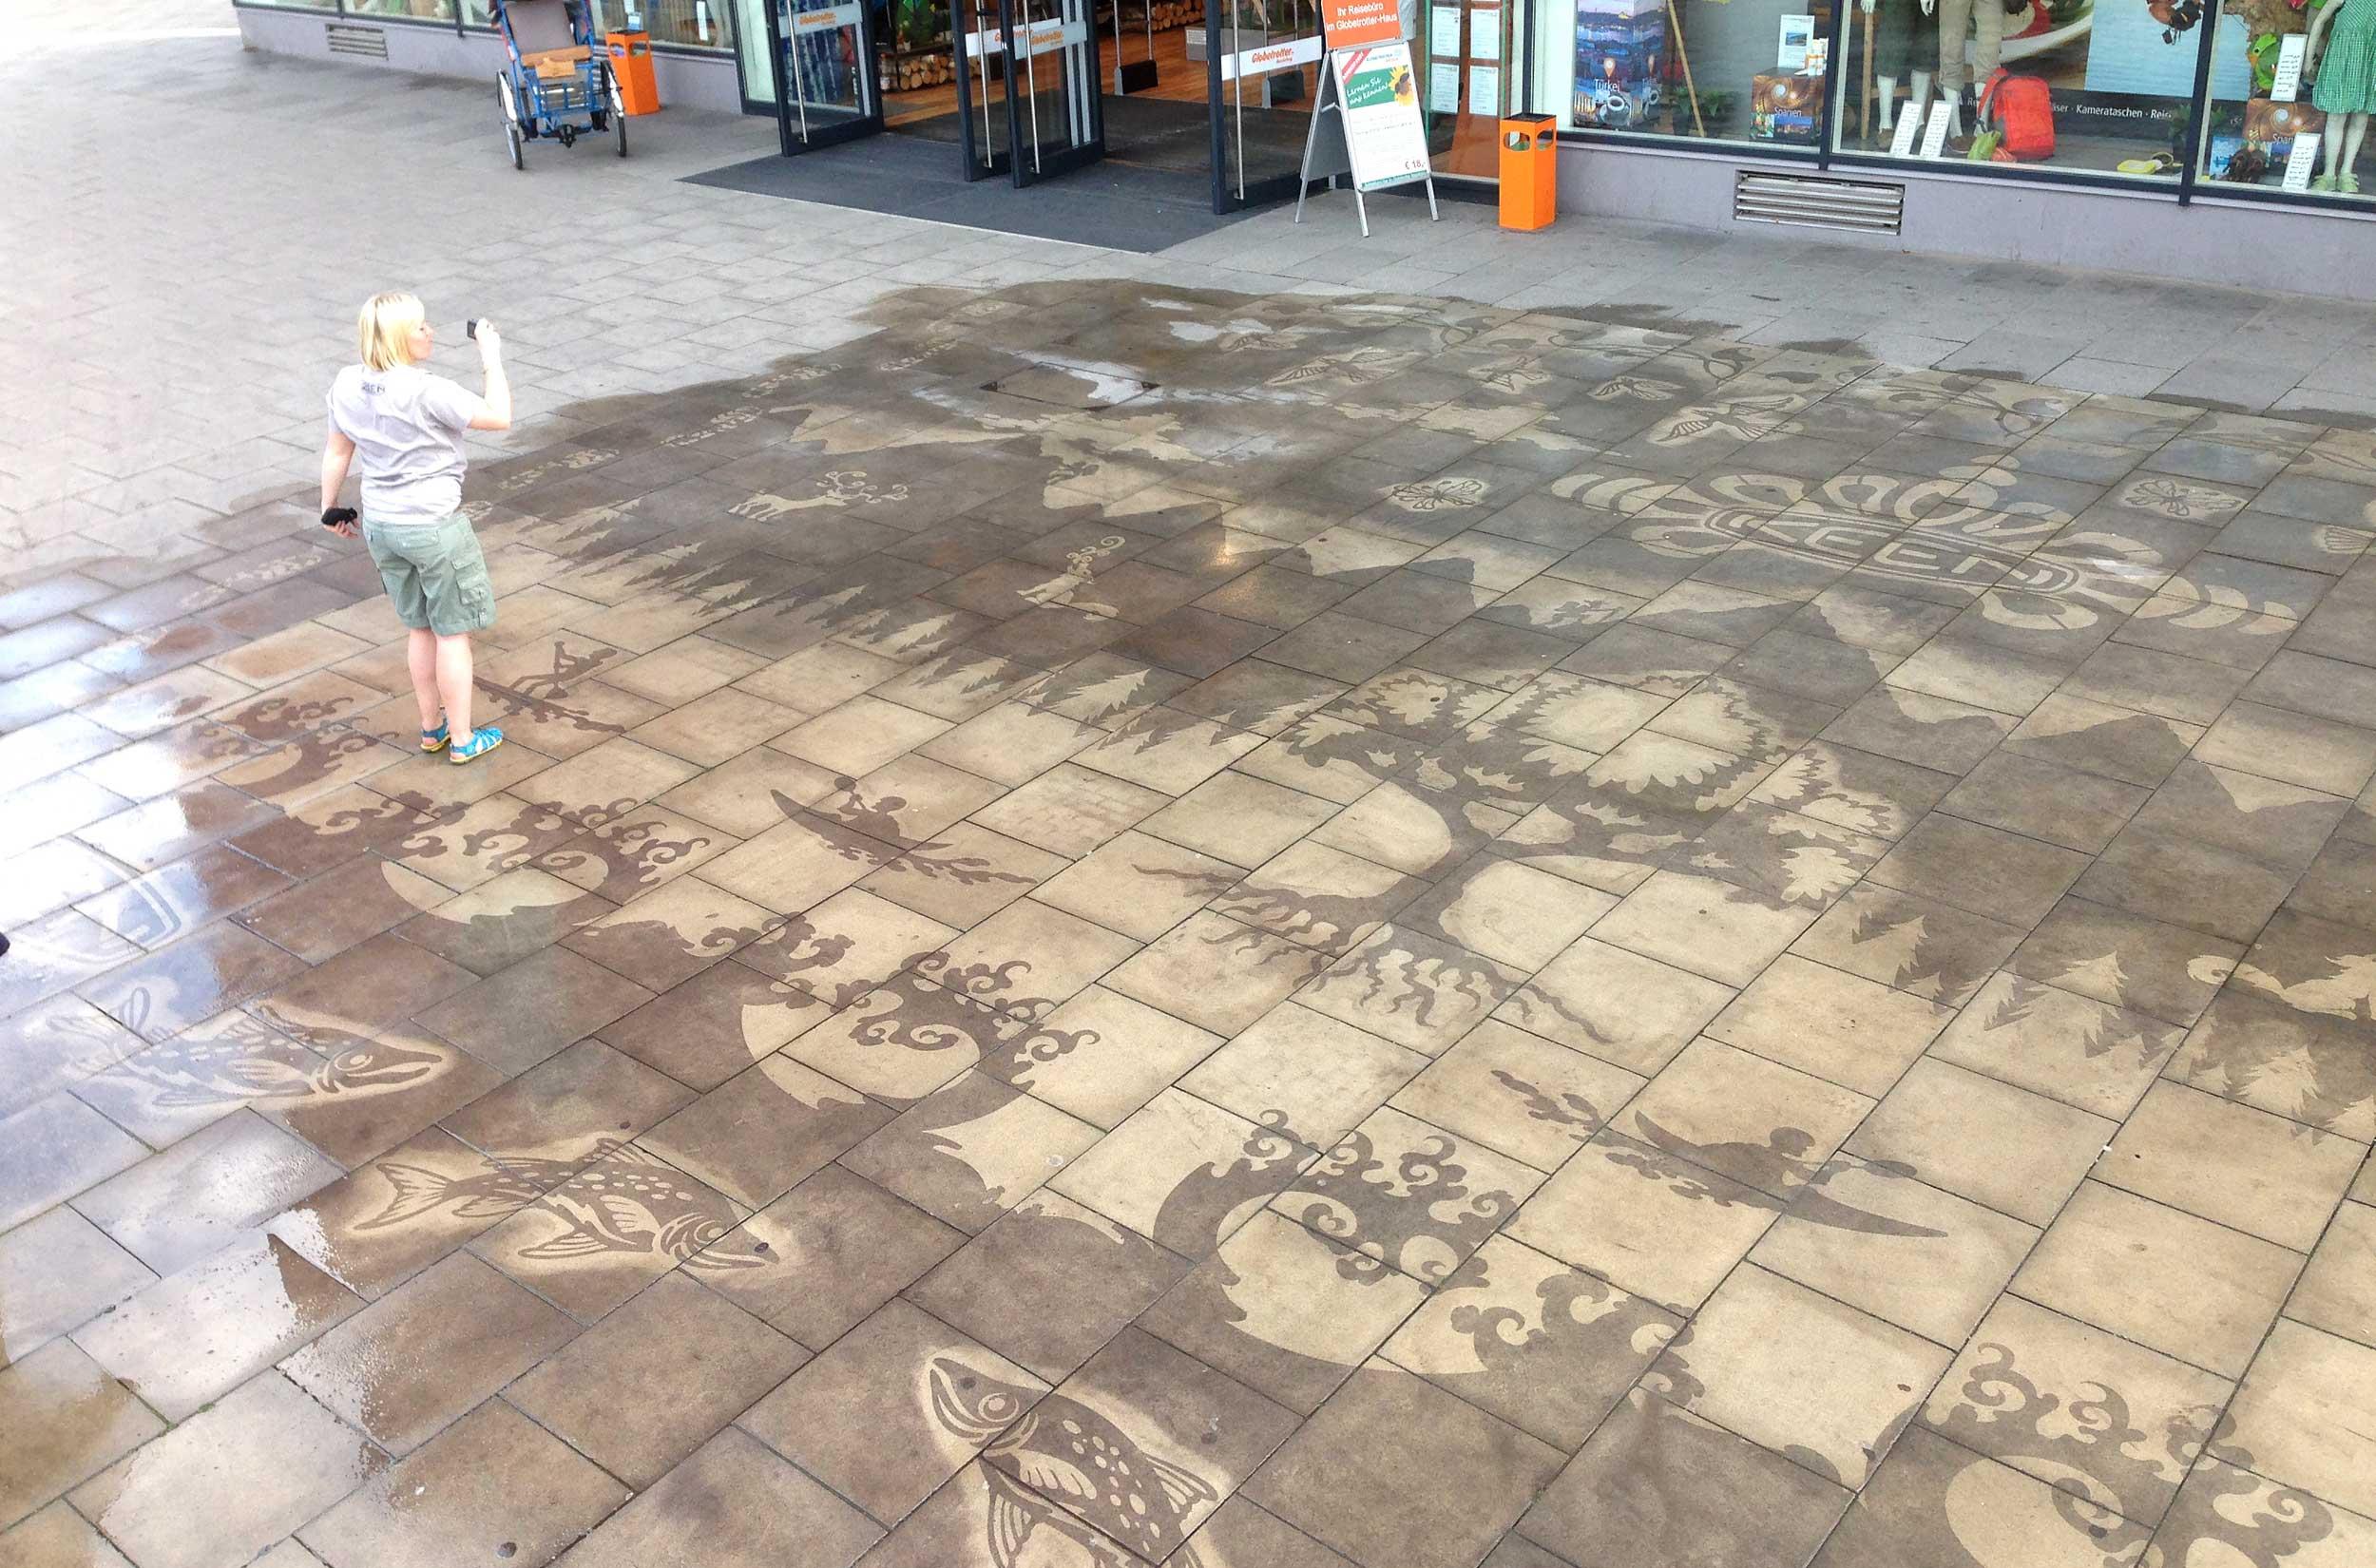 130 M2 sidewalk mural produced by GreenGraffiti® Netherlands